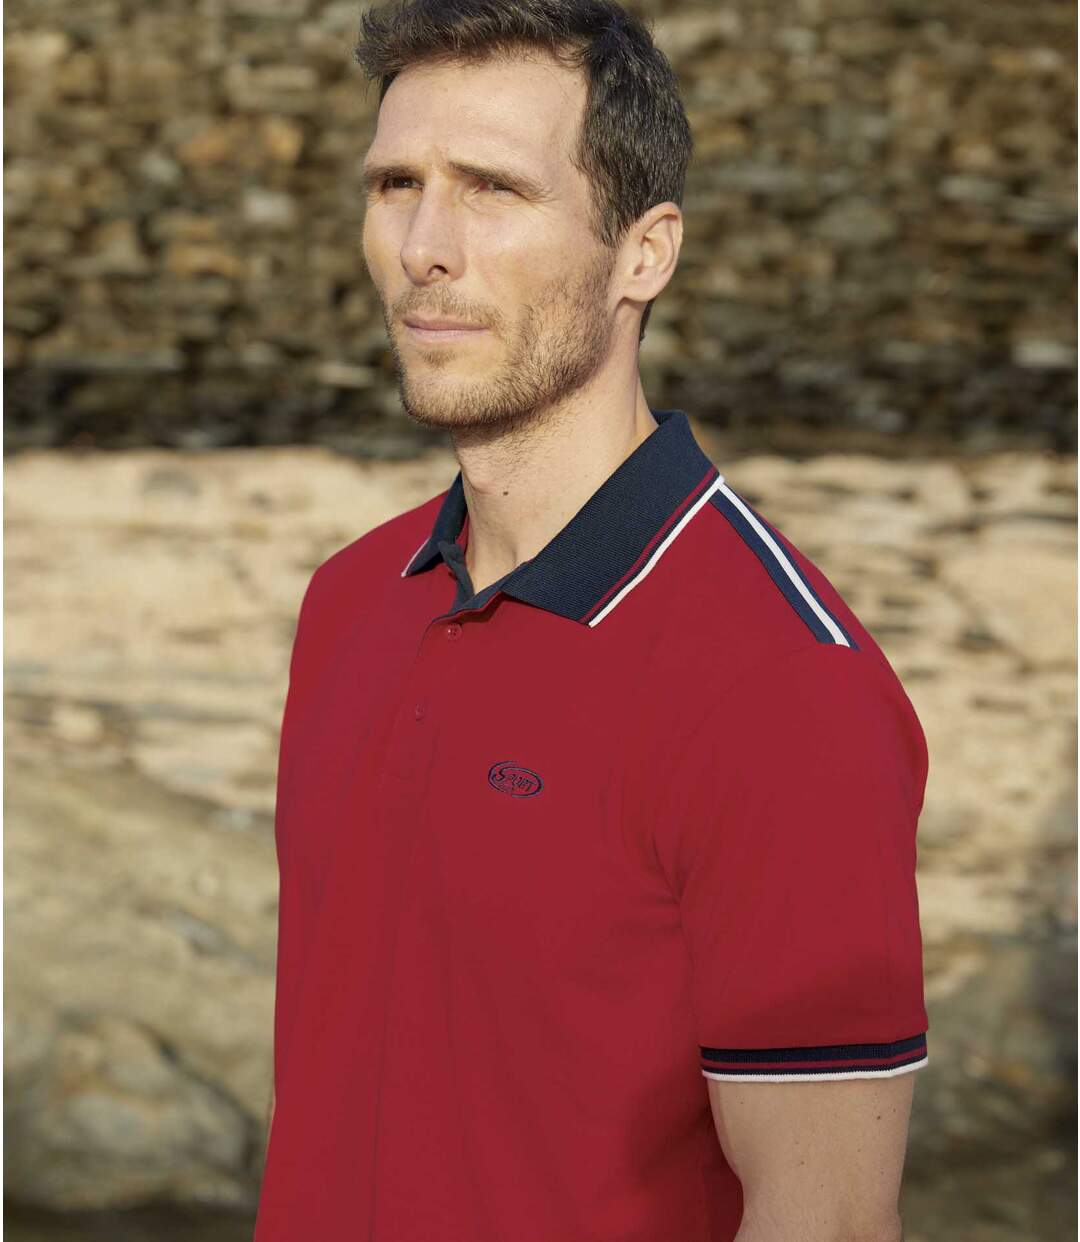 2er-Pack Poloshirts Sport in Piqué-Qualität